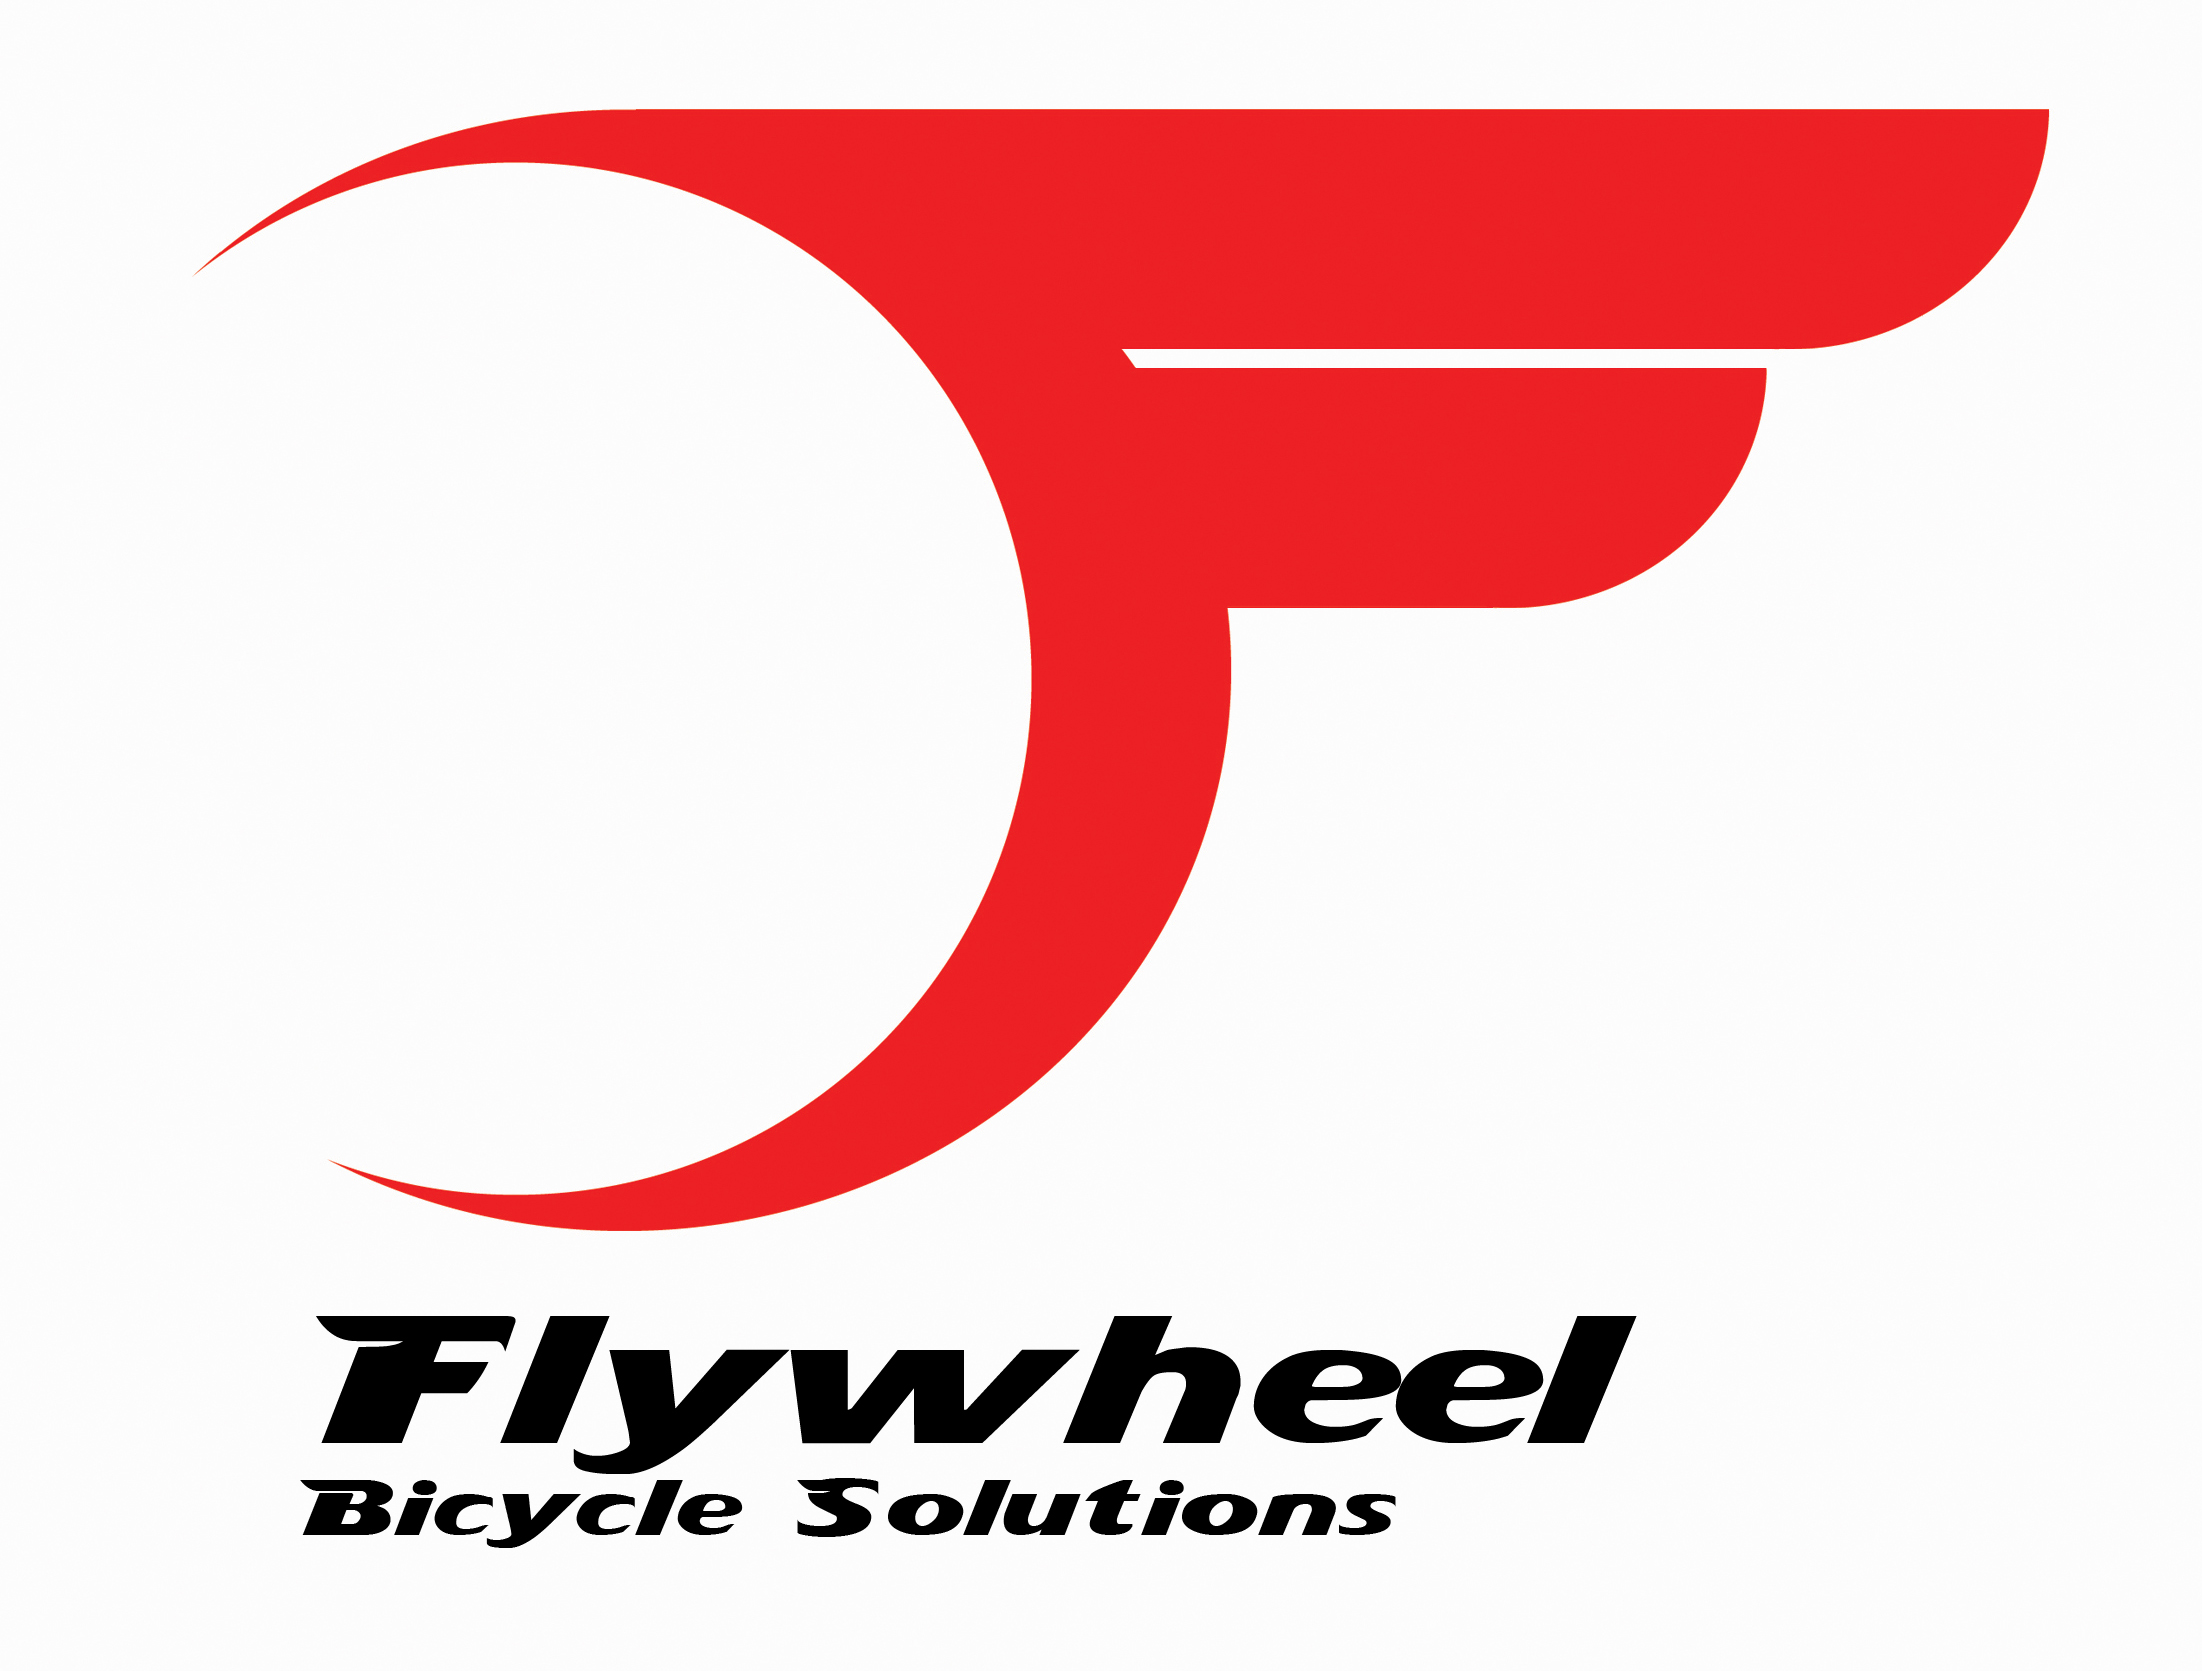 flywheel logo and font.jpg